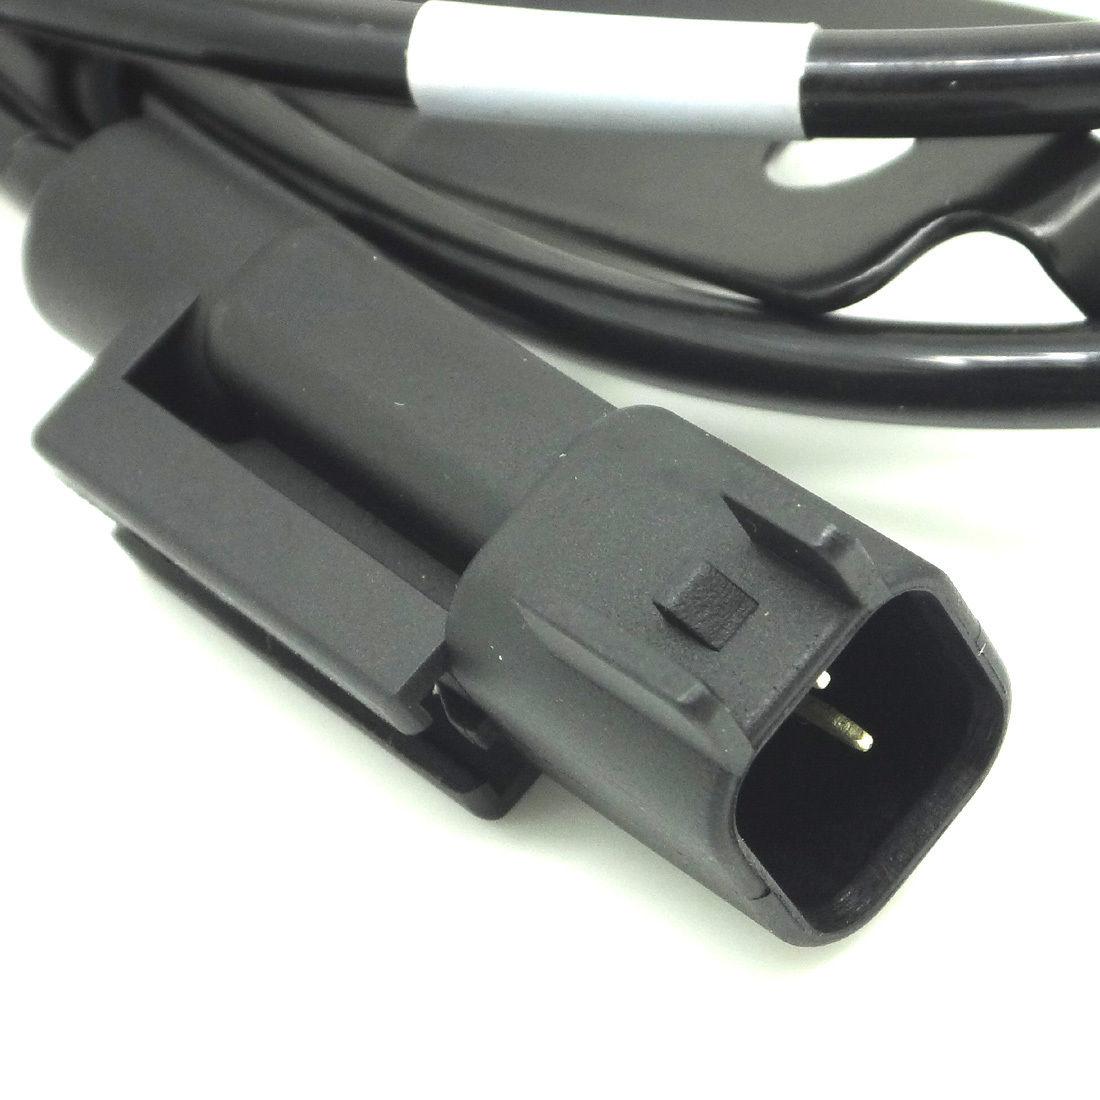 Sensor Freio ABS Asx Outlander 2.4 3.0 4X2 07 a 12 Dianteiro Esquerdo 4670a575 4670a031